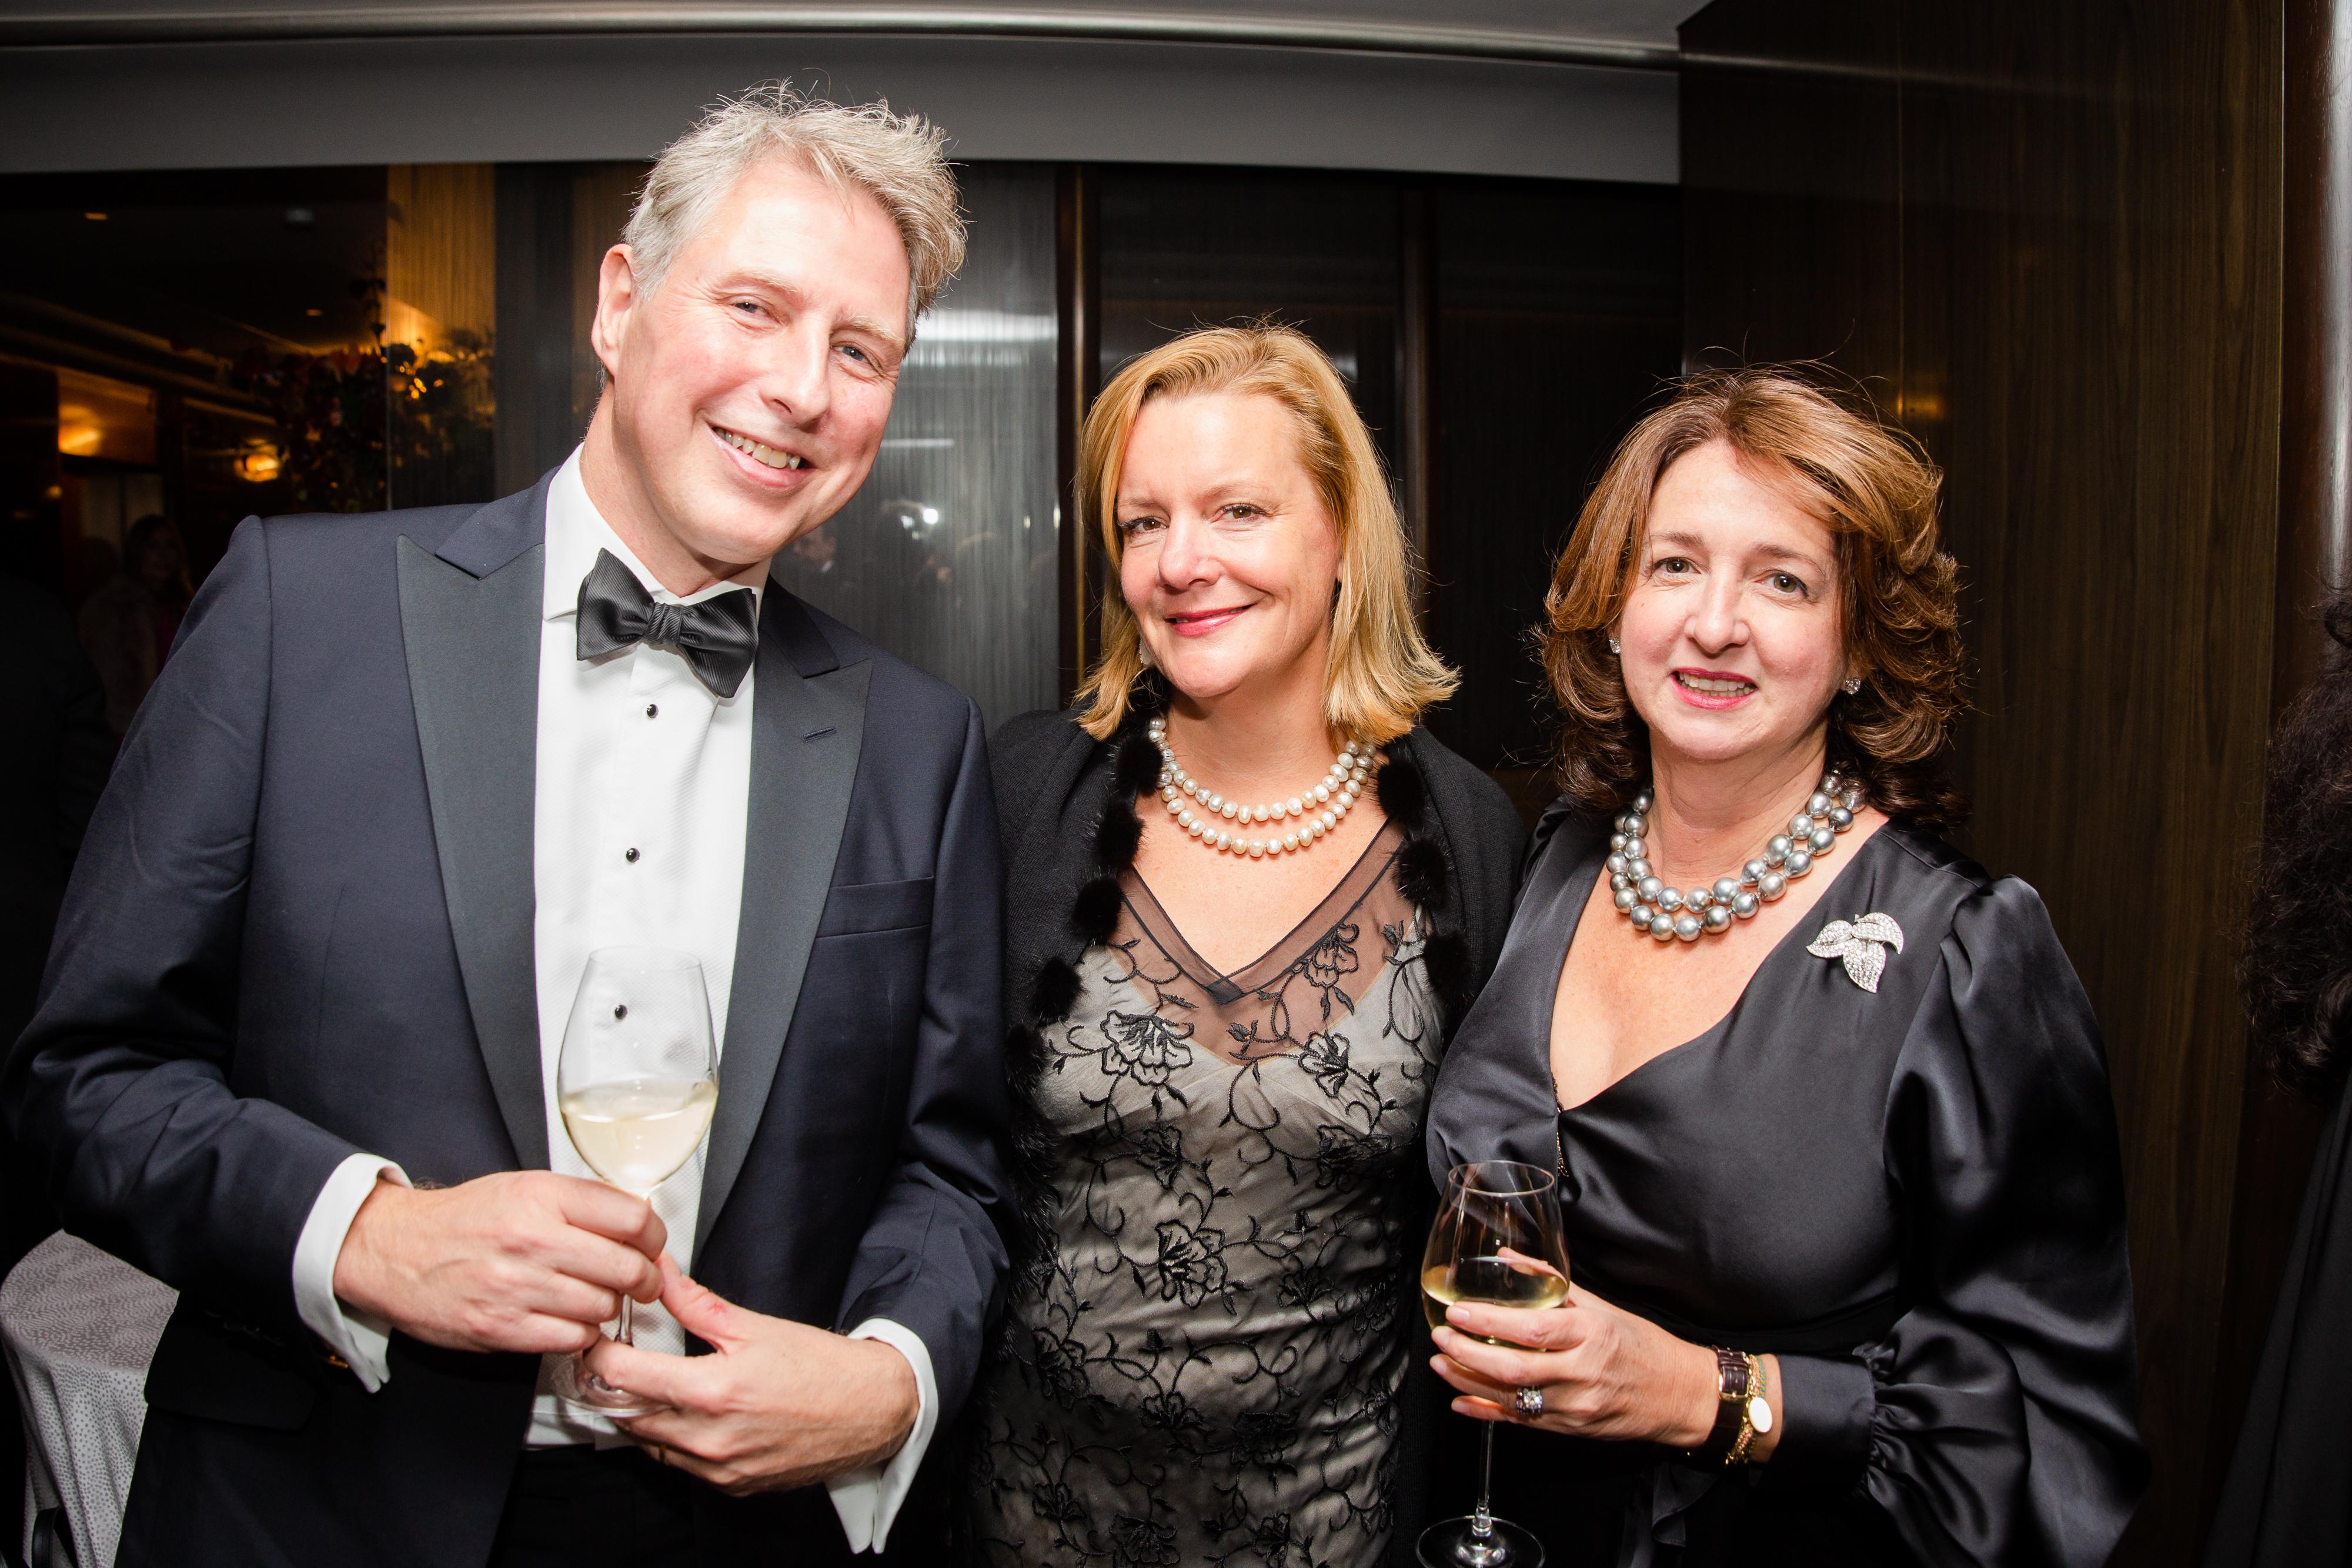 John Darlington, Amy Todd Middleton, and Ewi Shafran.